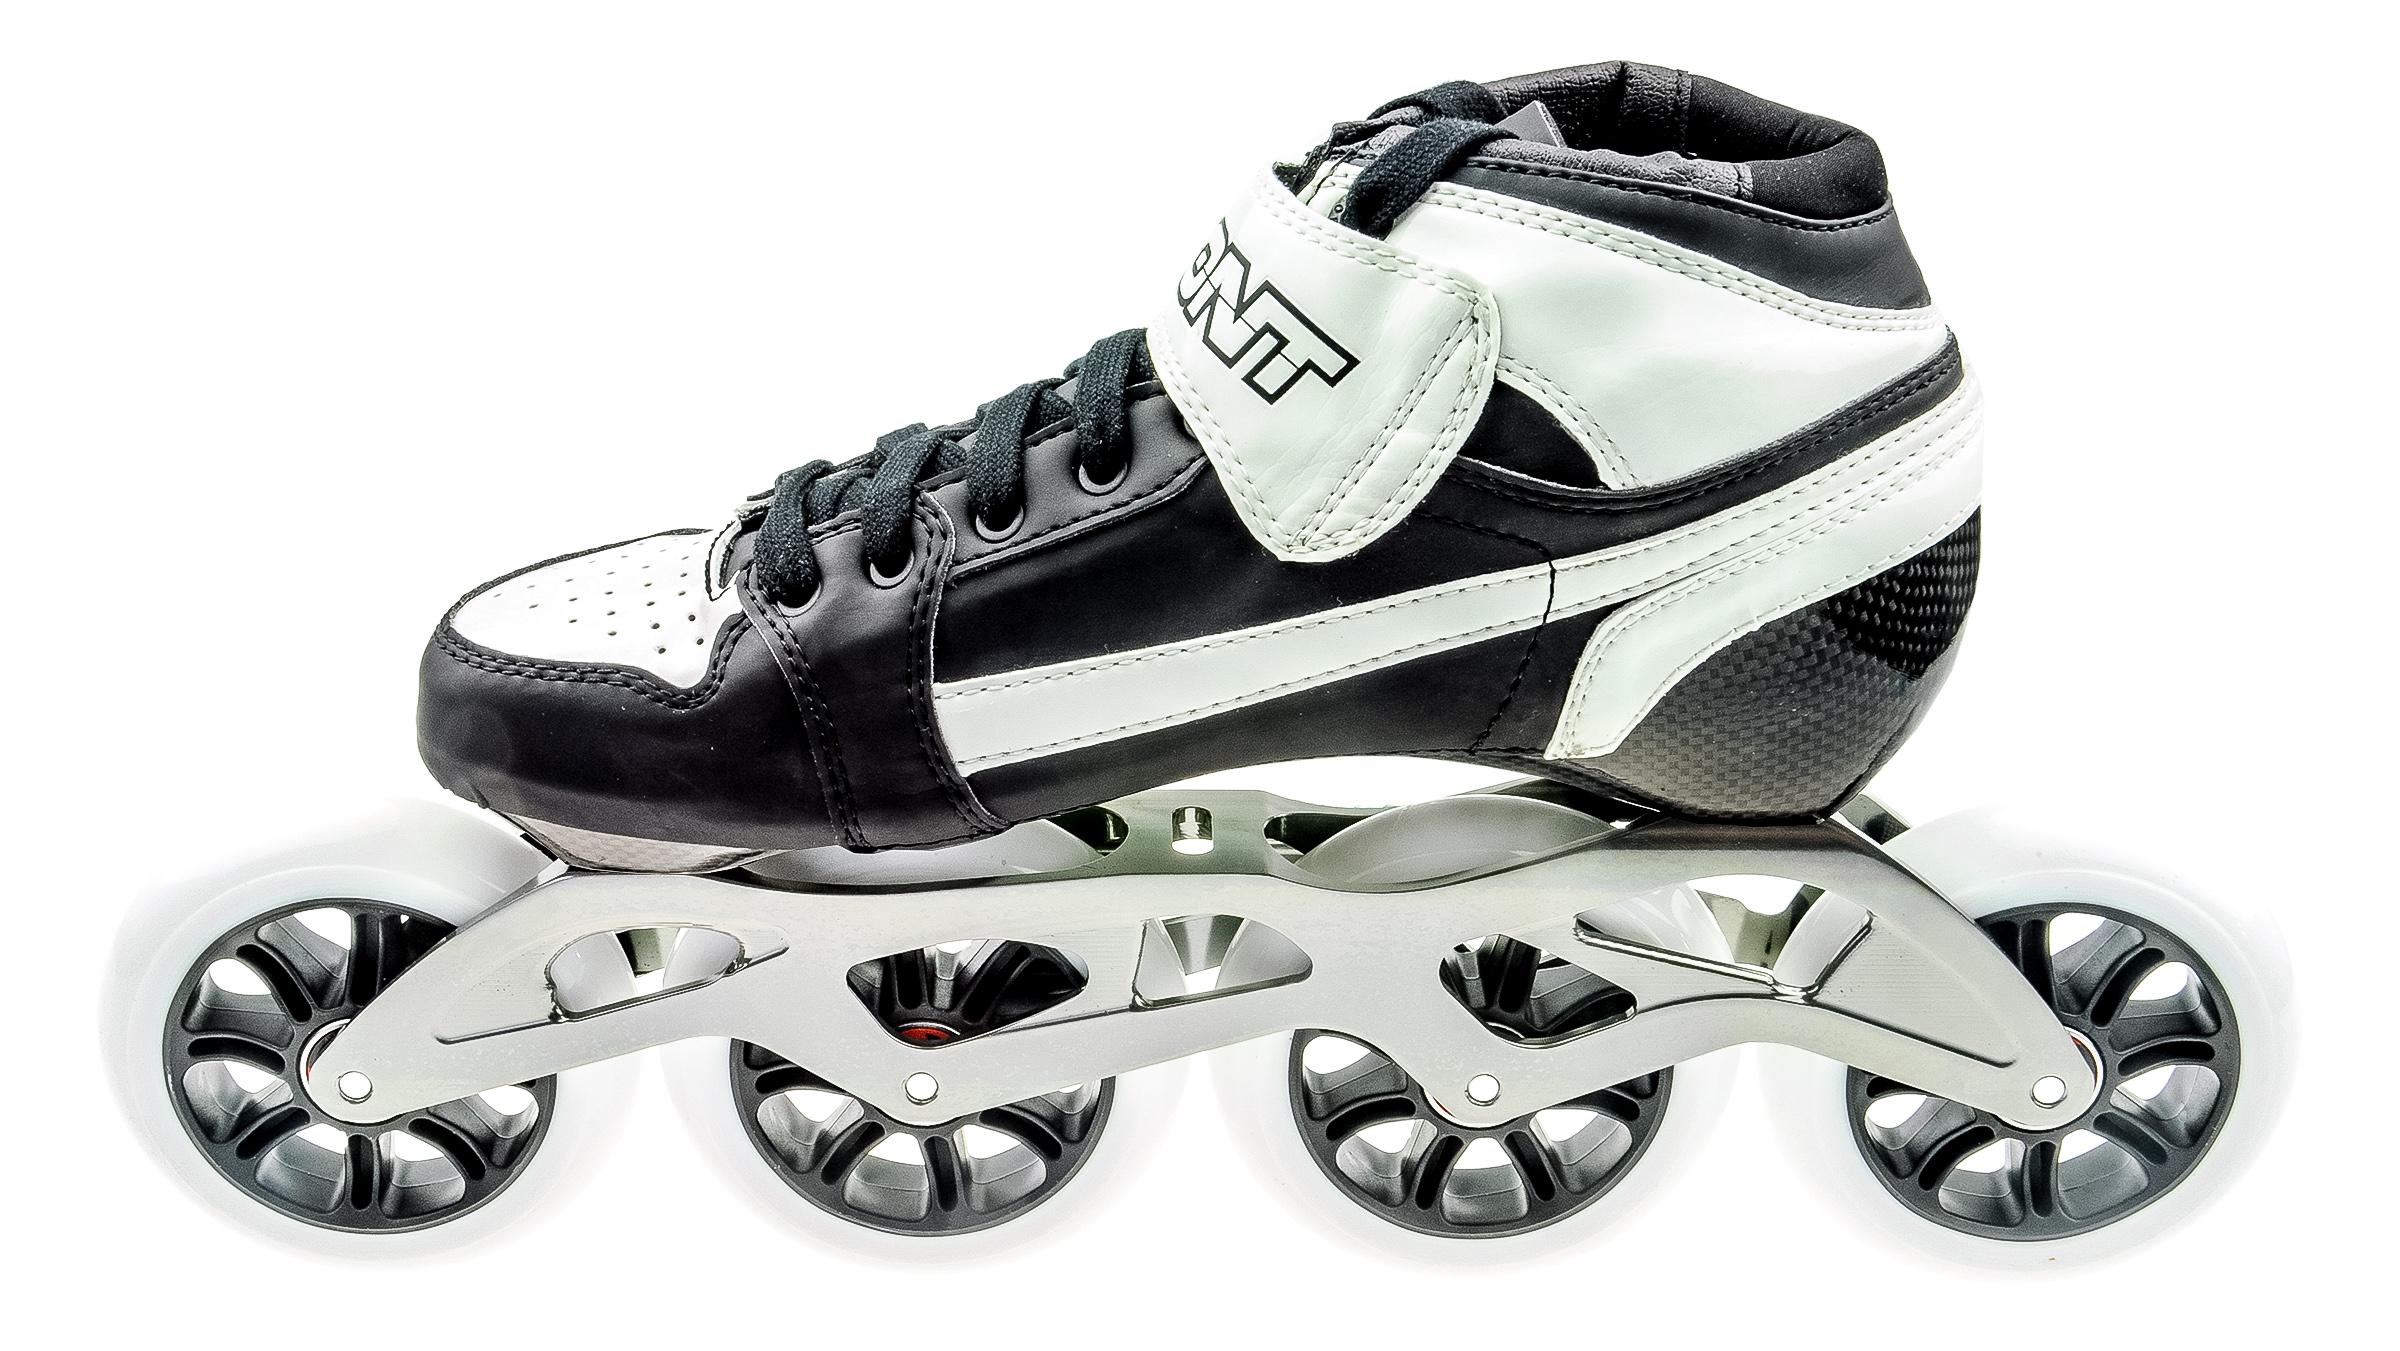 82087cf04ca Bont Pursuit Skate Zwart/Wit 4x100 bestellen bij Skate-dump.nl